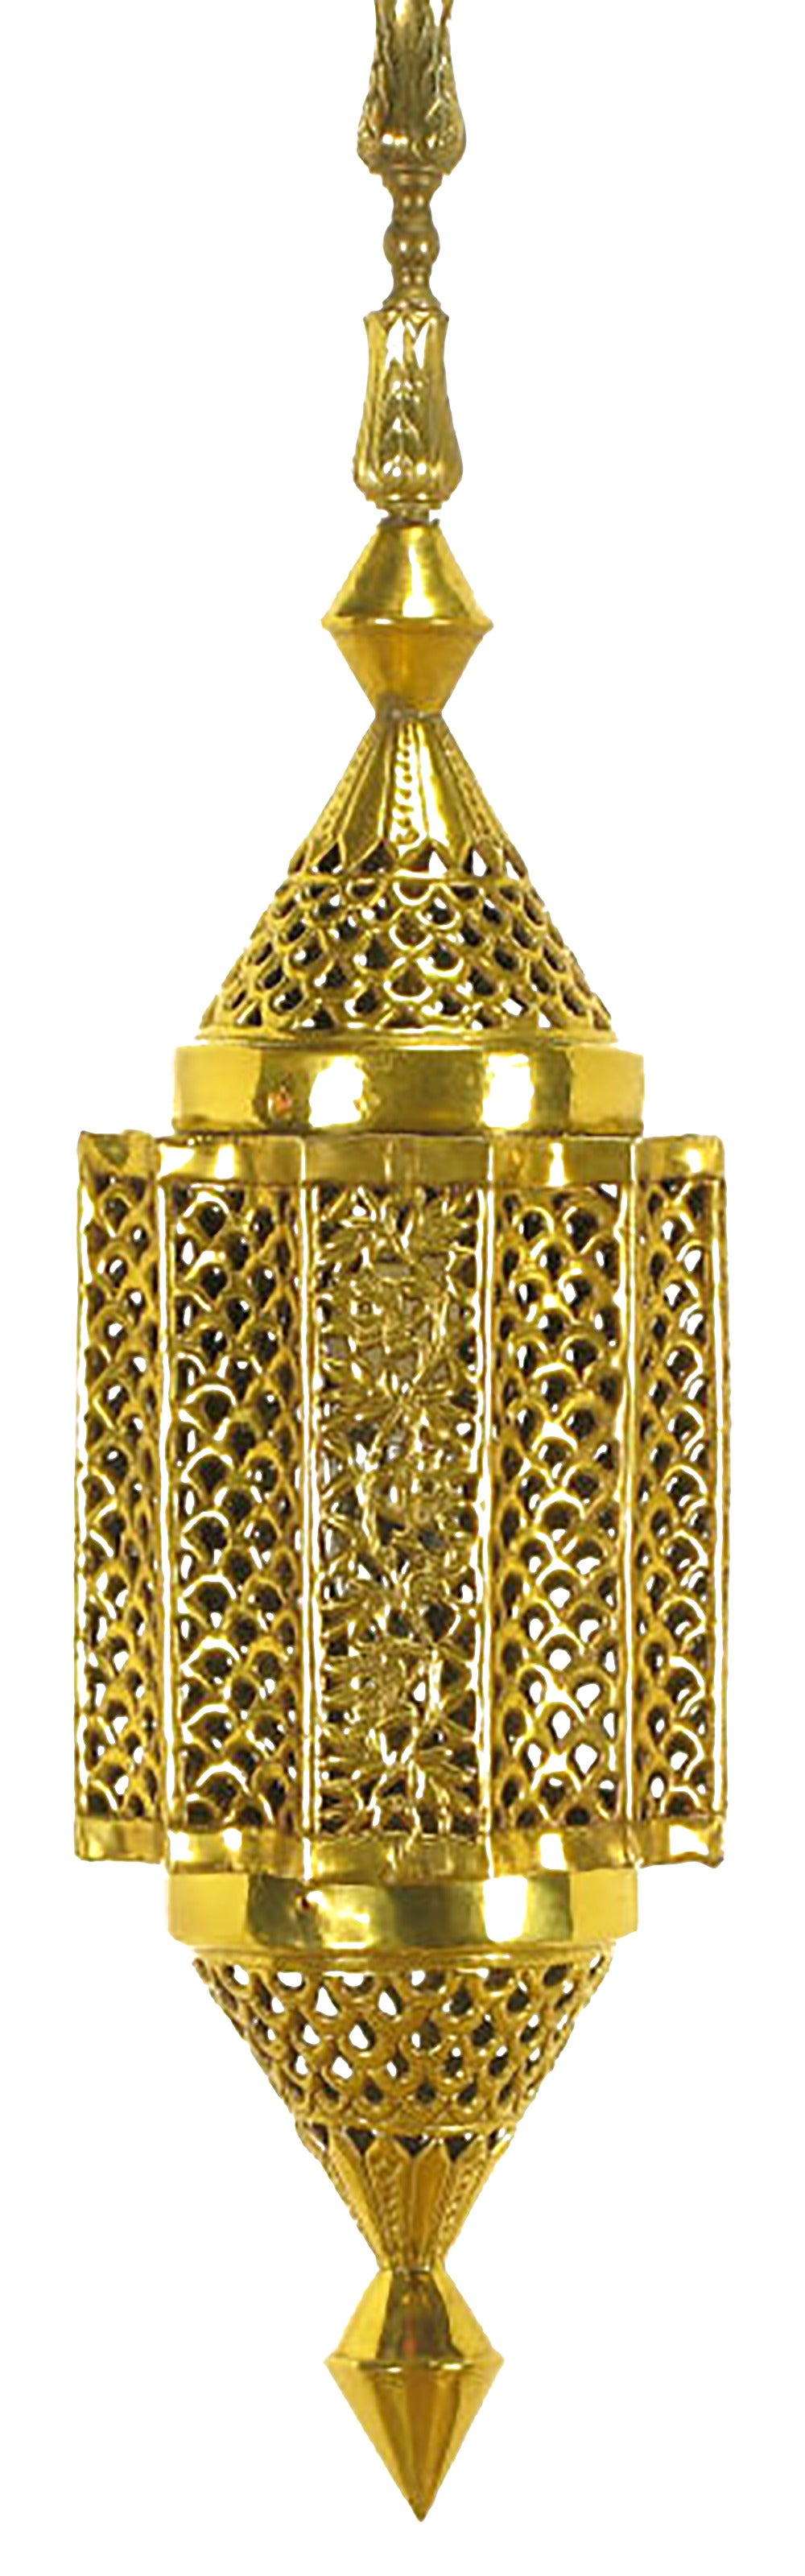 brass pendant lighting. moroccan style reticulated brass pendant light 2 lighting